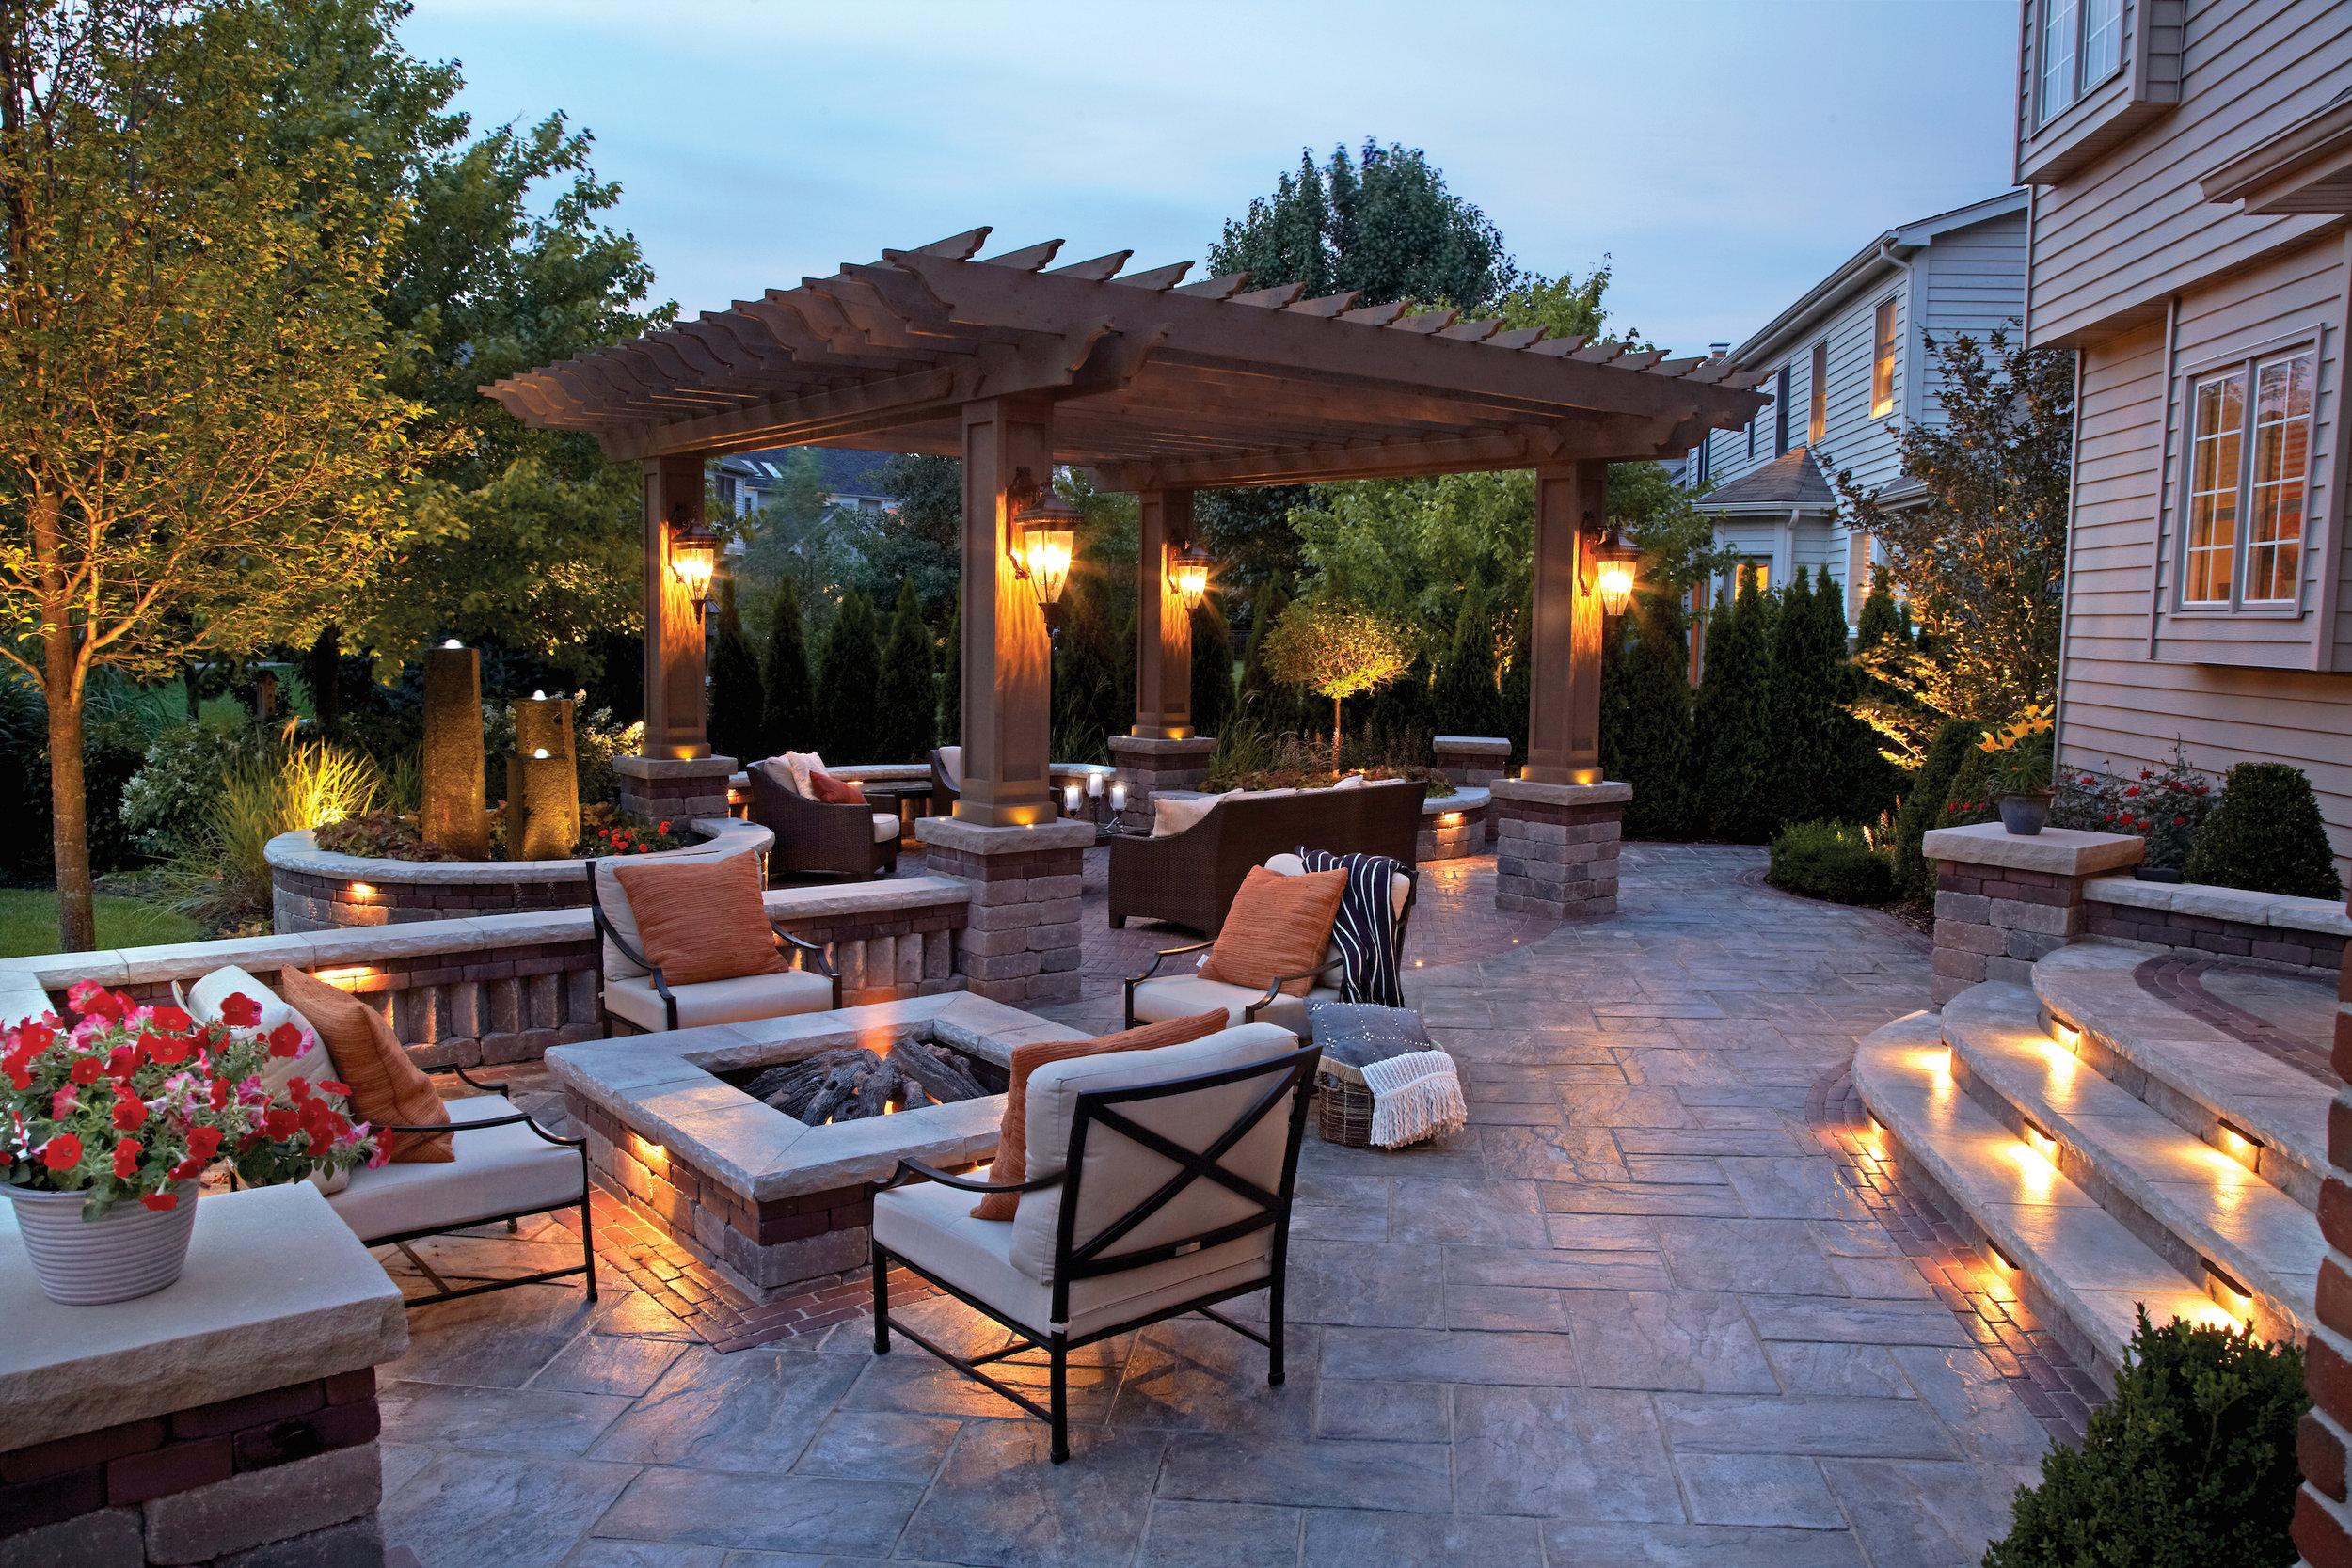 Professional landscape design with paving stones inBergen County, NJ